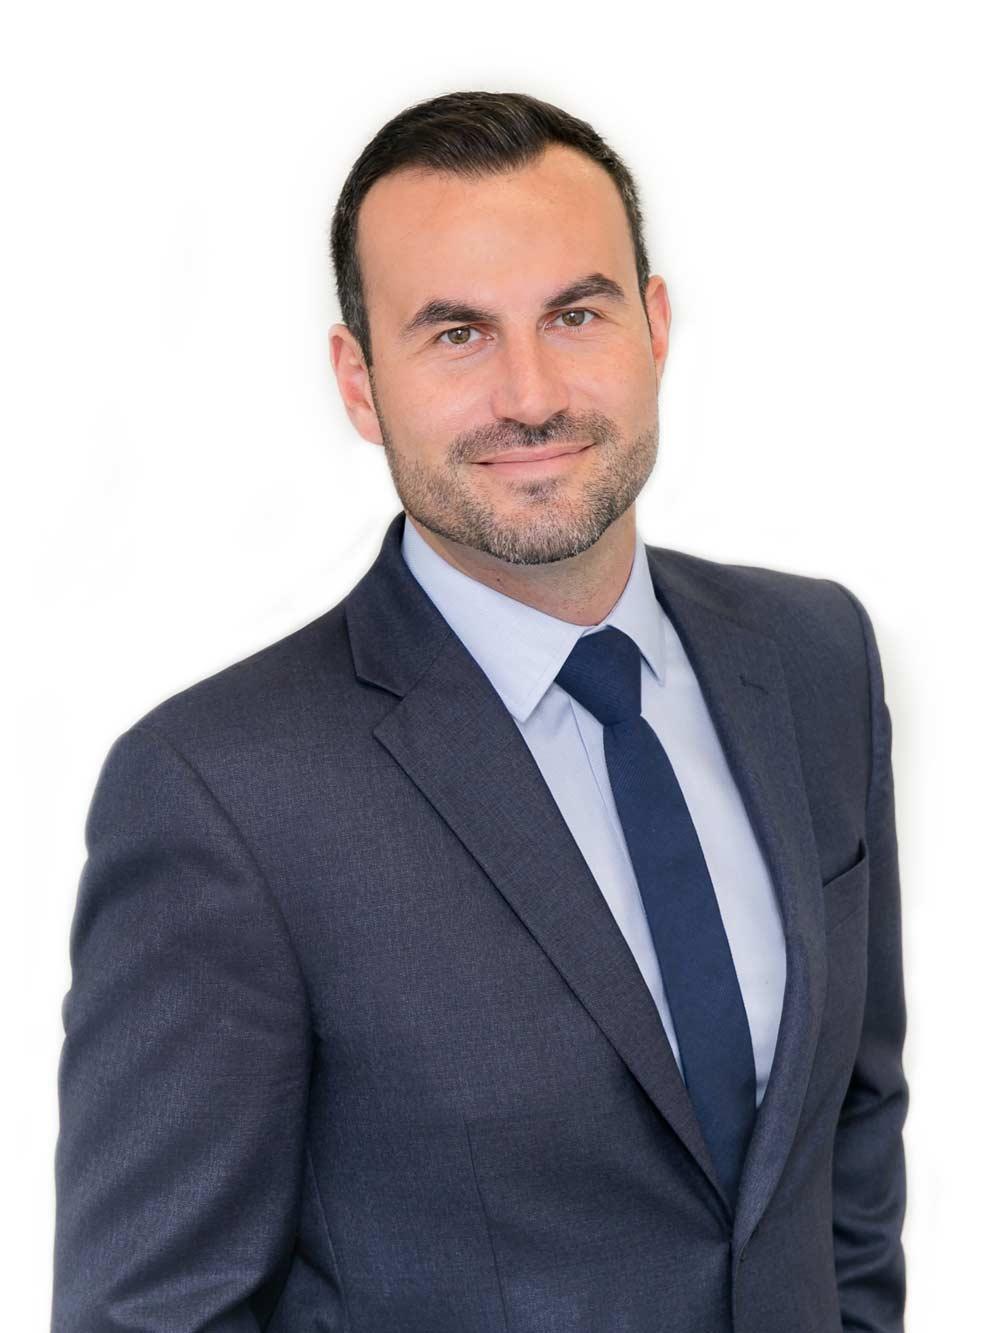 Adam Touni